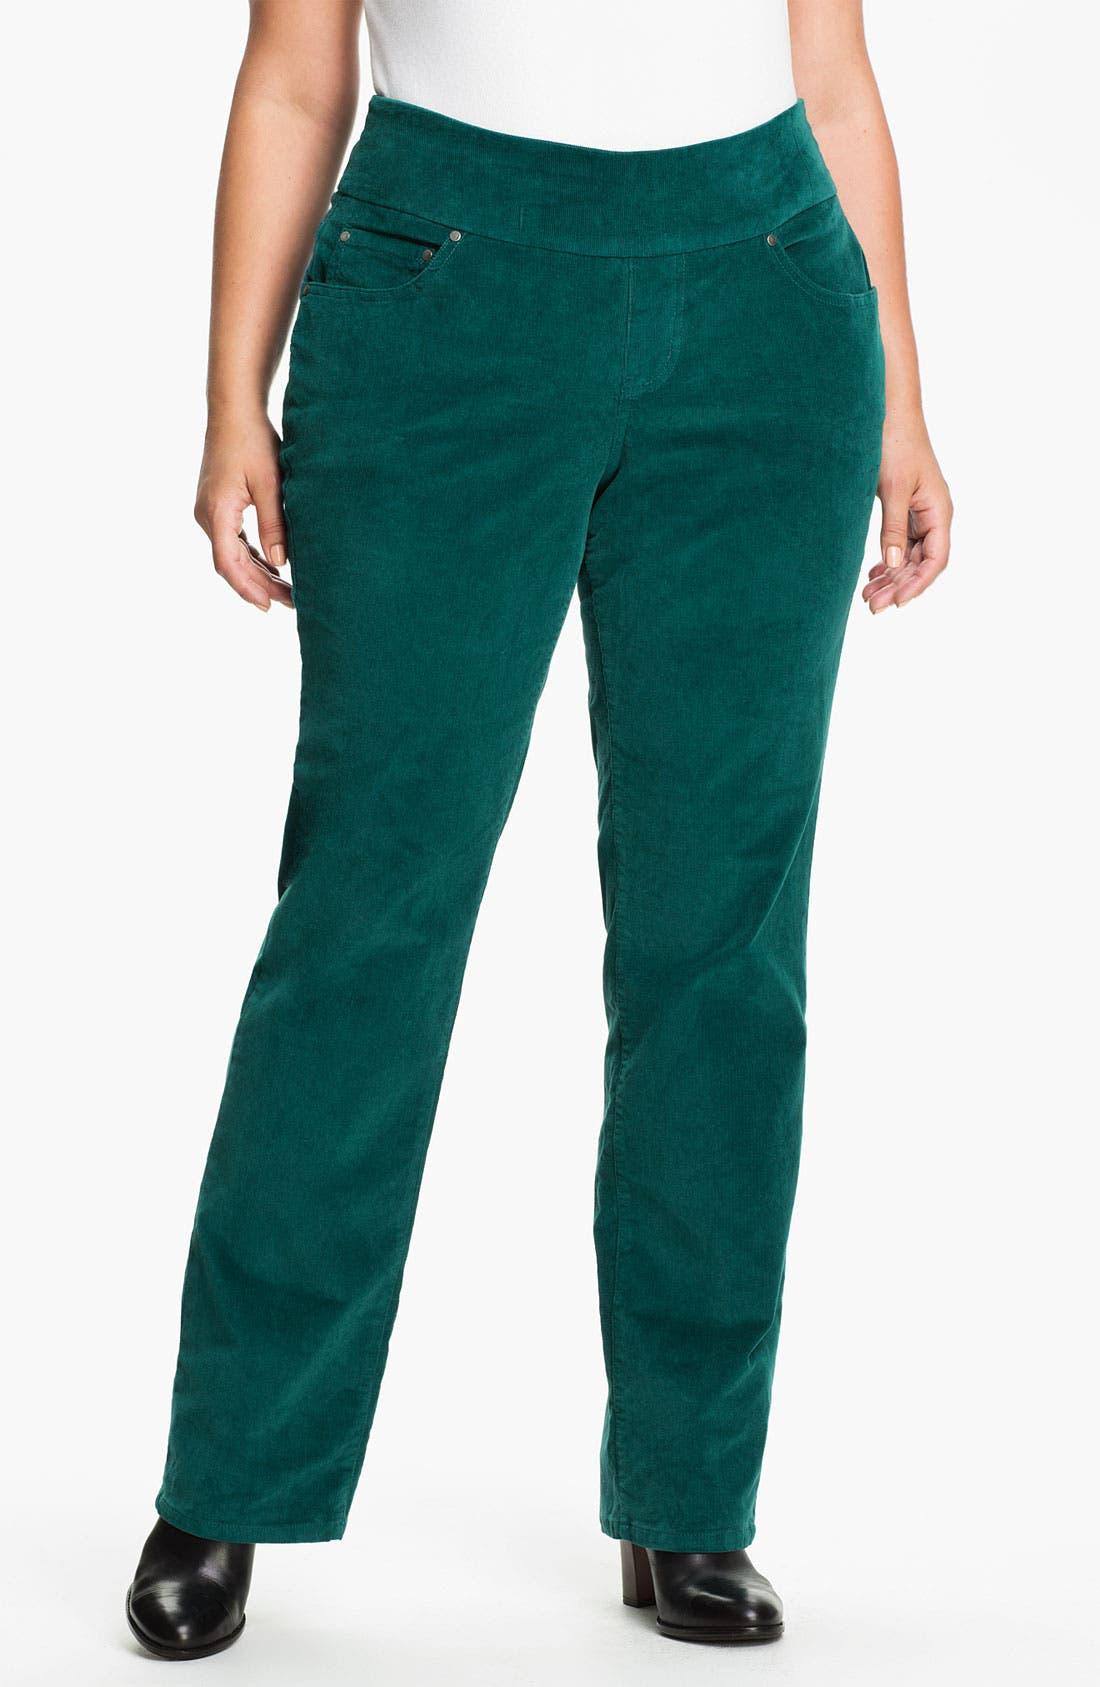 Alternate Image 1 Selected - Jag Jeans 'Peri' Straight Leg Corduroy Pants (Plus)